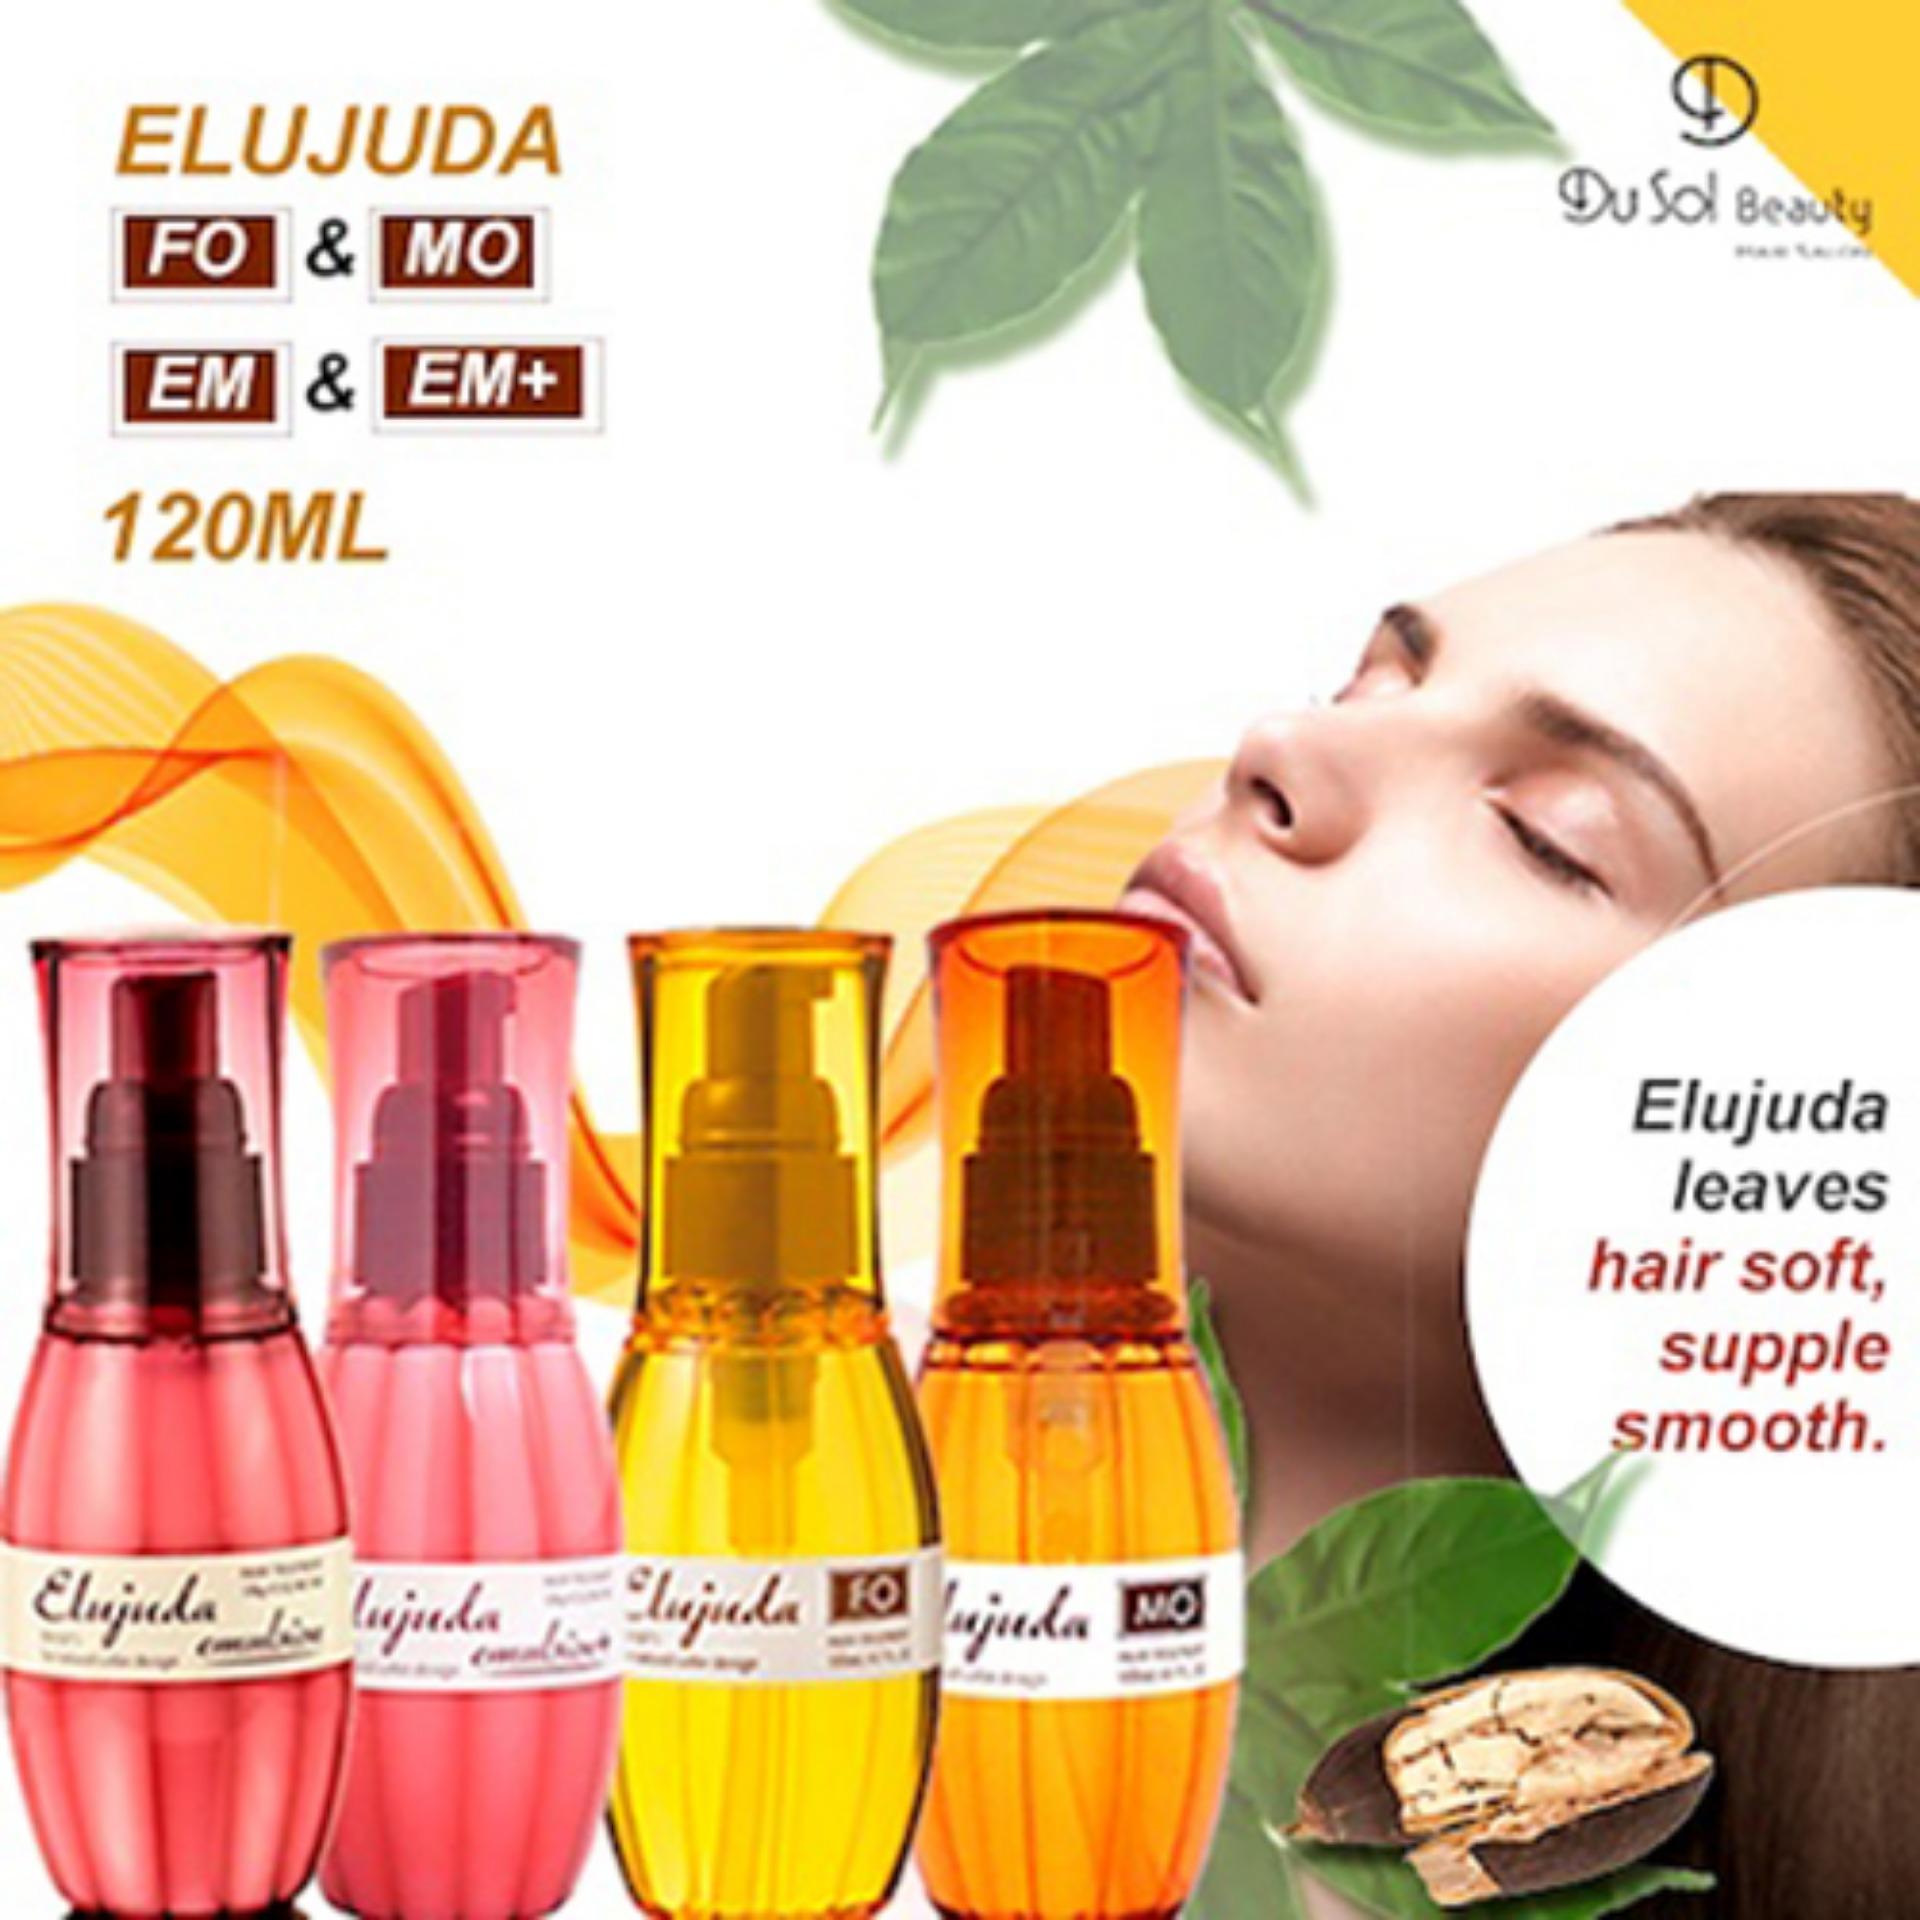 Milbon Deesse S Elujuda Mo Hair Treatment 120Ml Deal